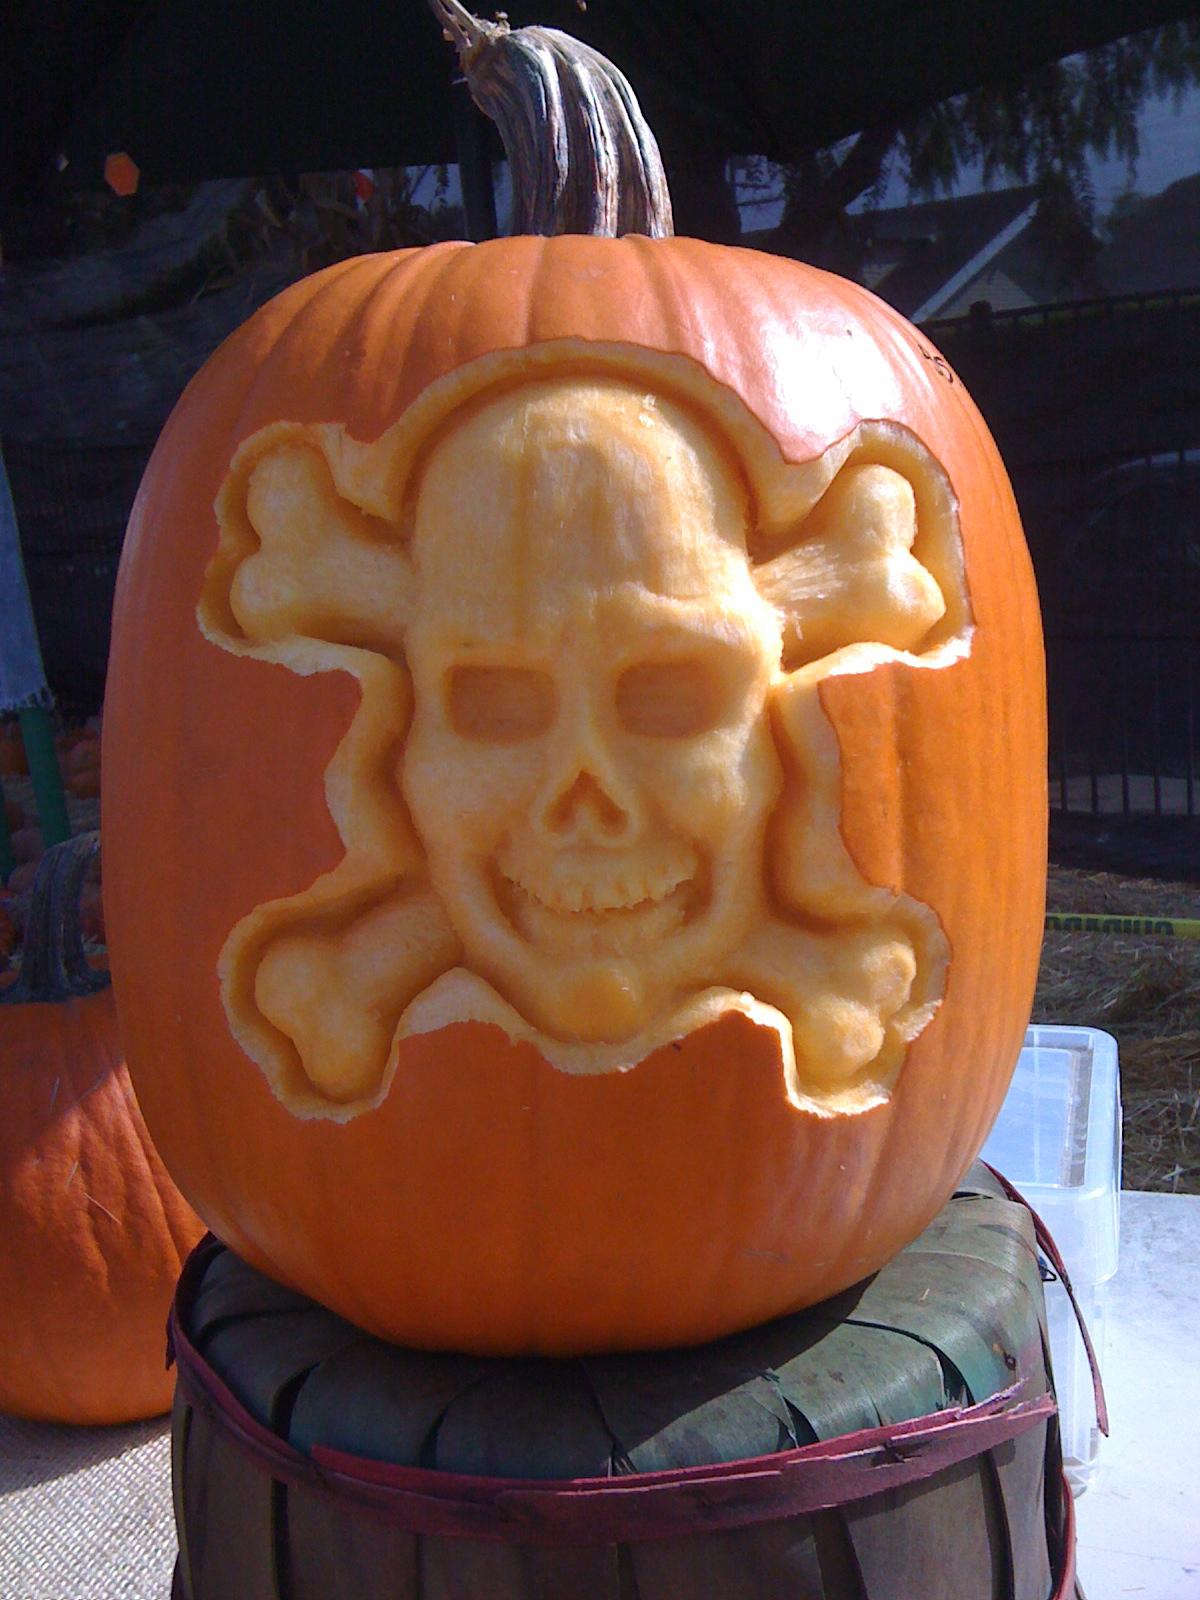 Nick petronzio sculpture halloween pumpkin carvings